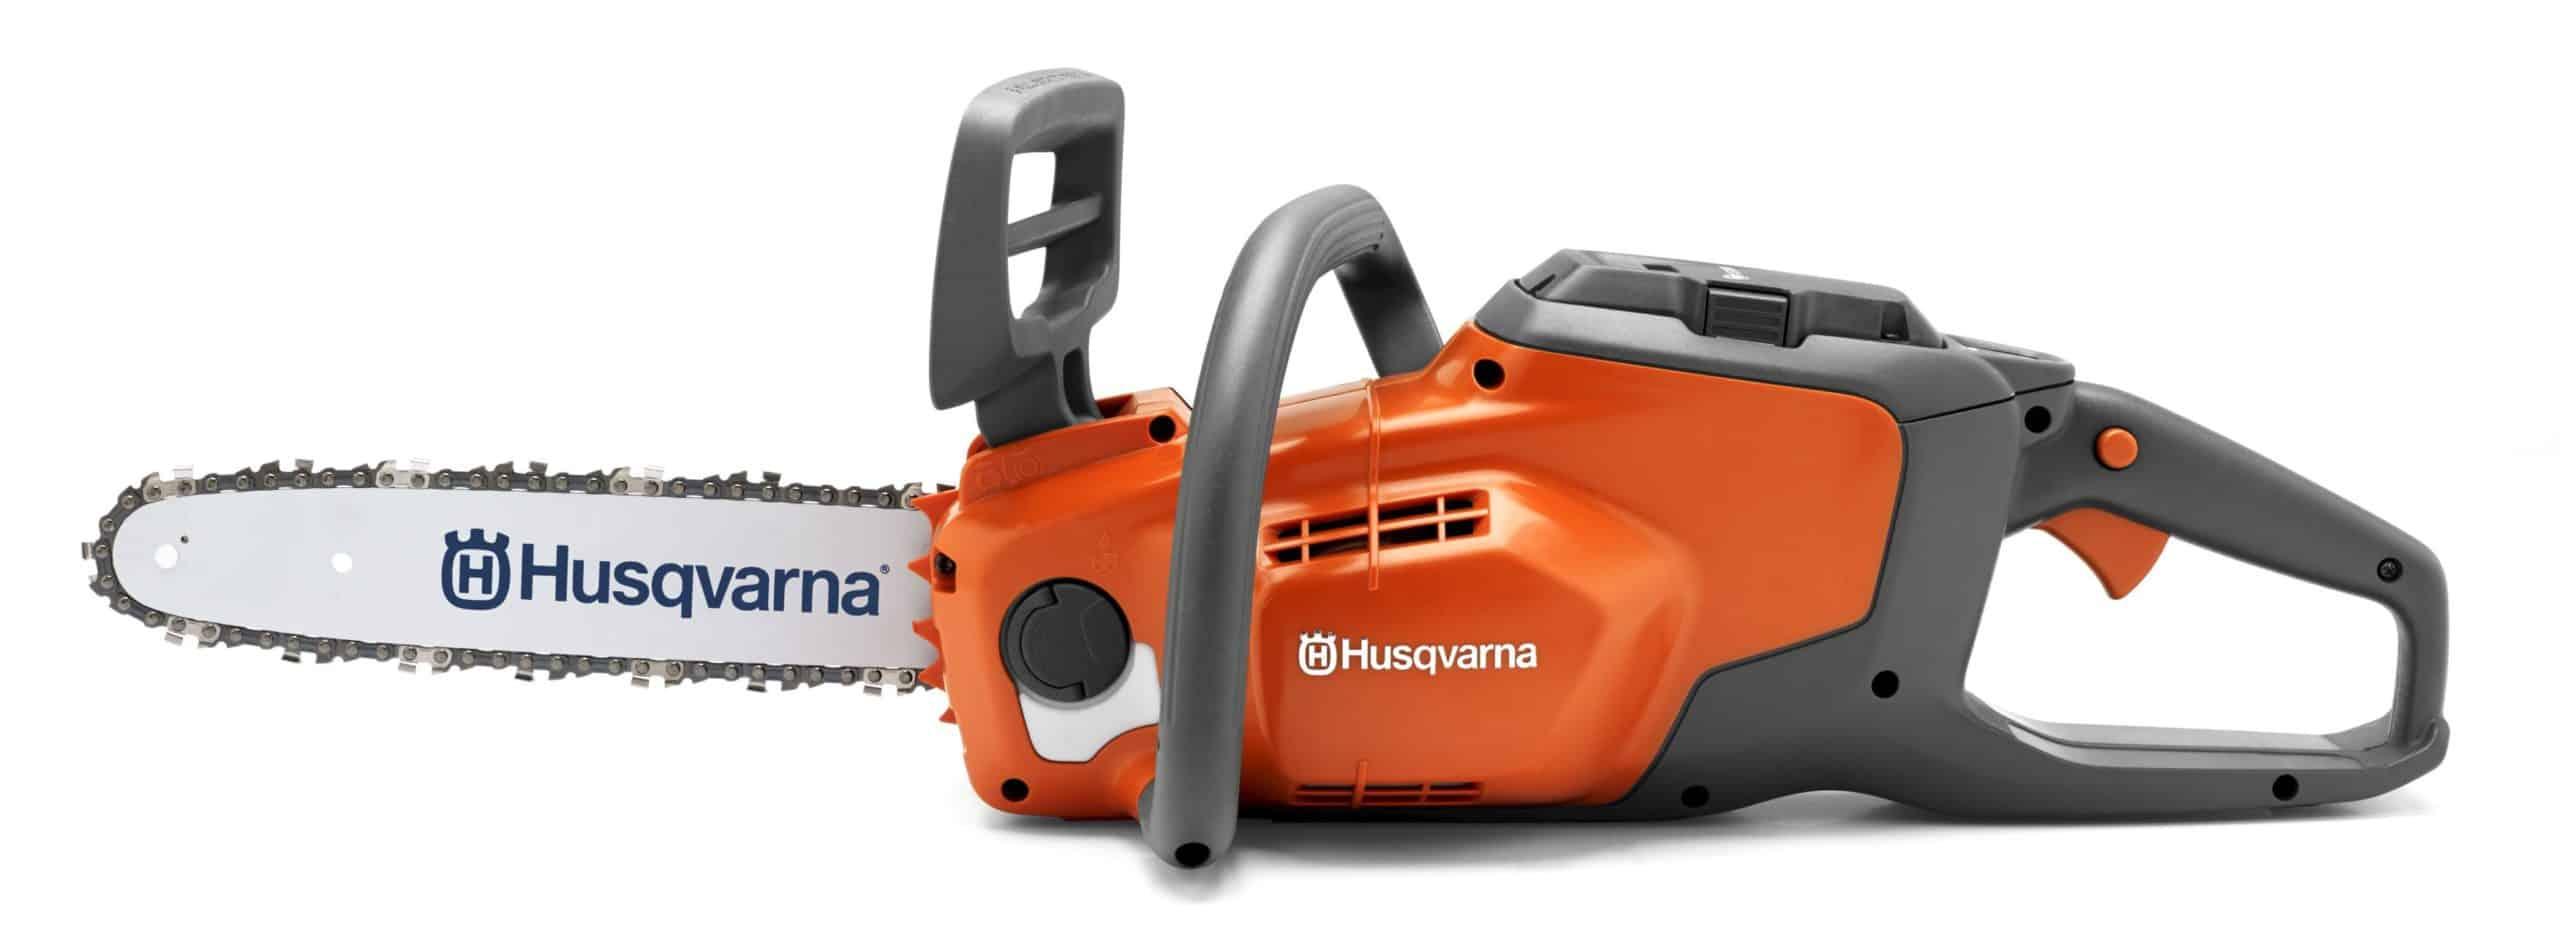 Husqvarna 120i Battery Chainsaw Kit